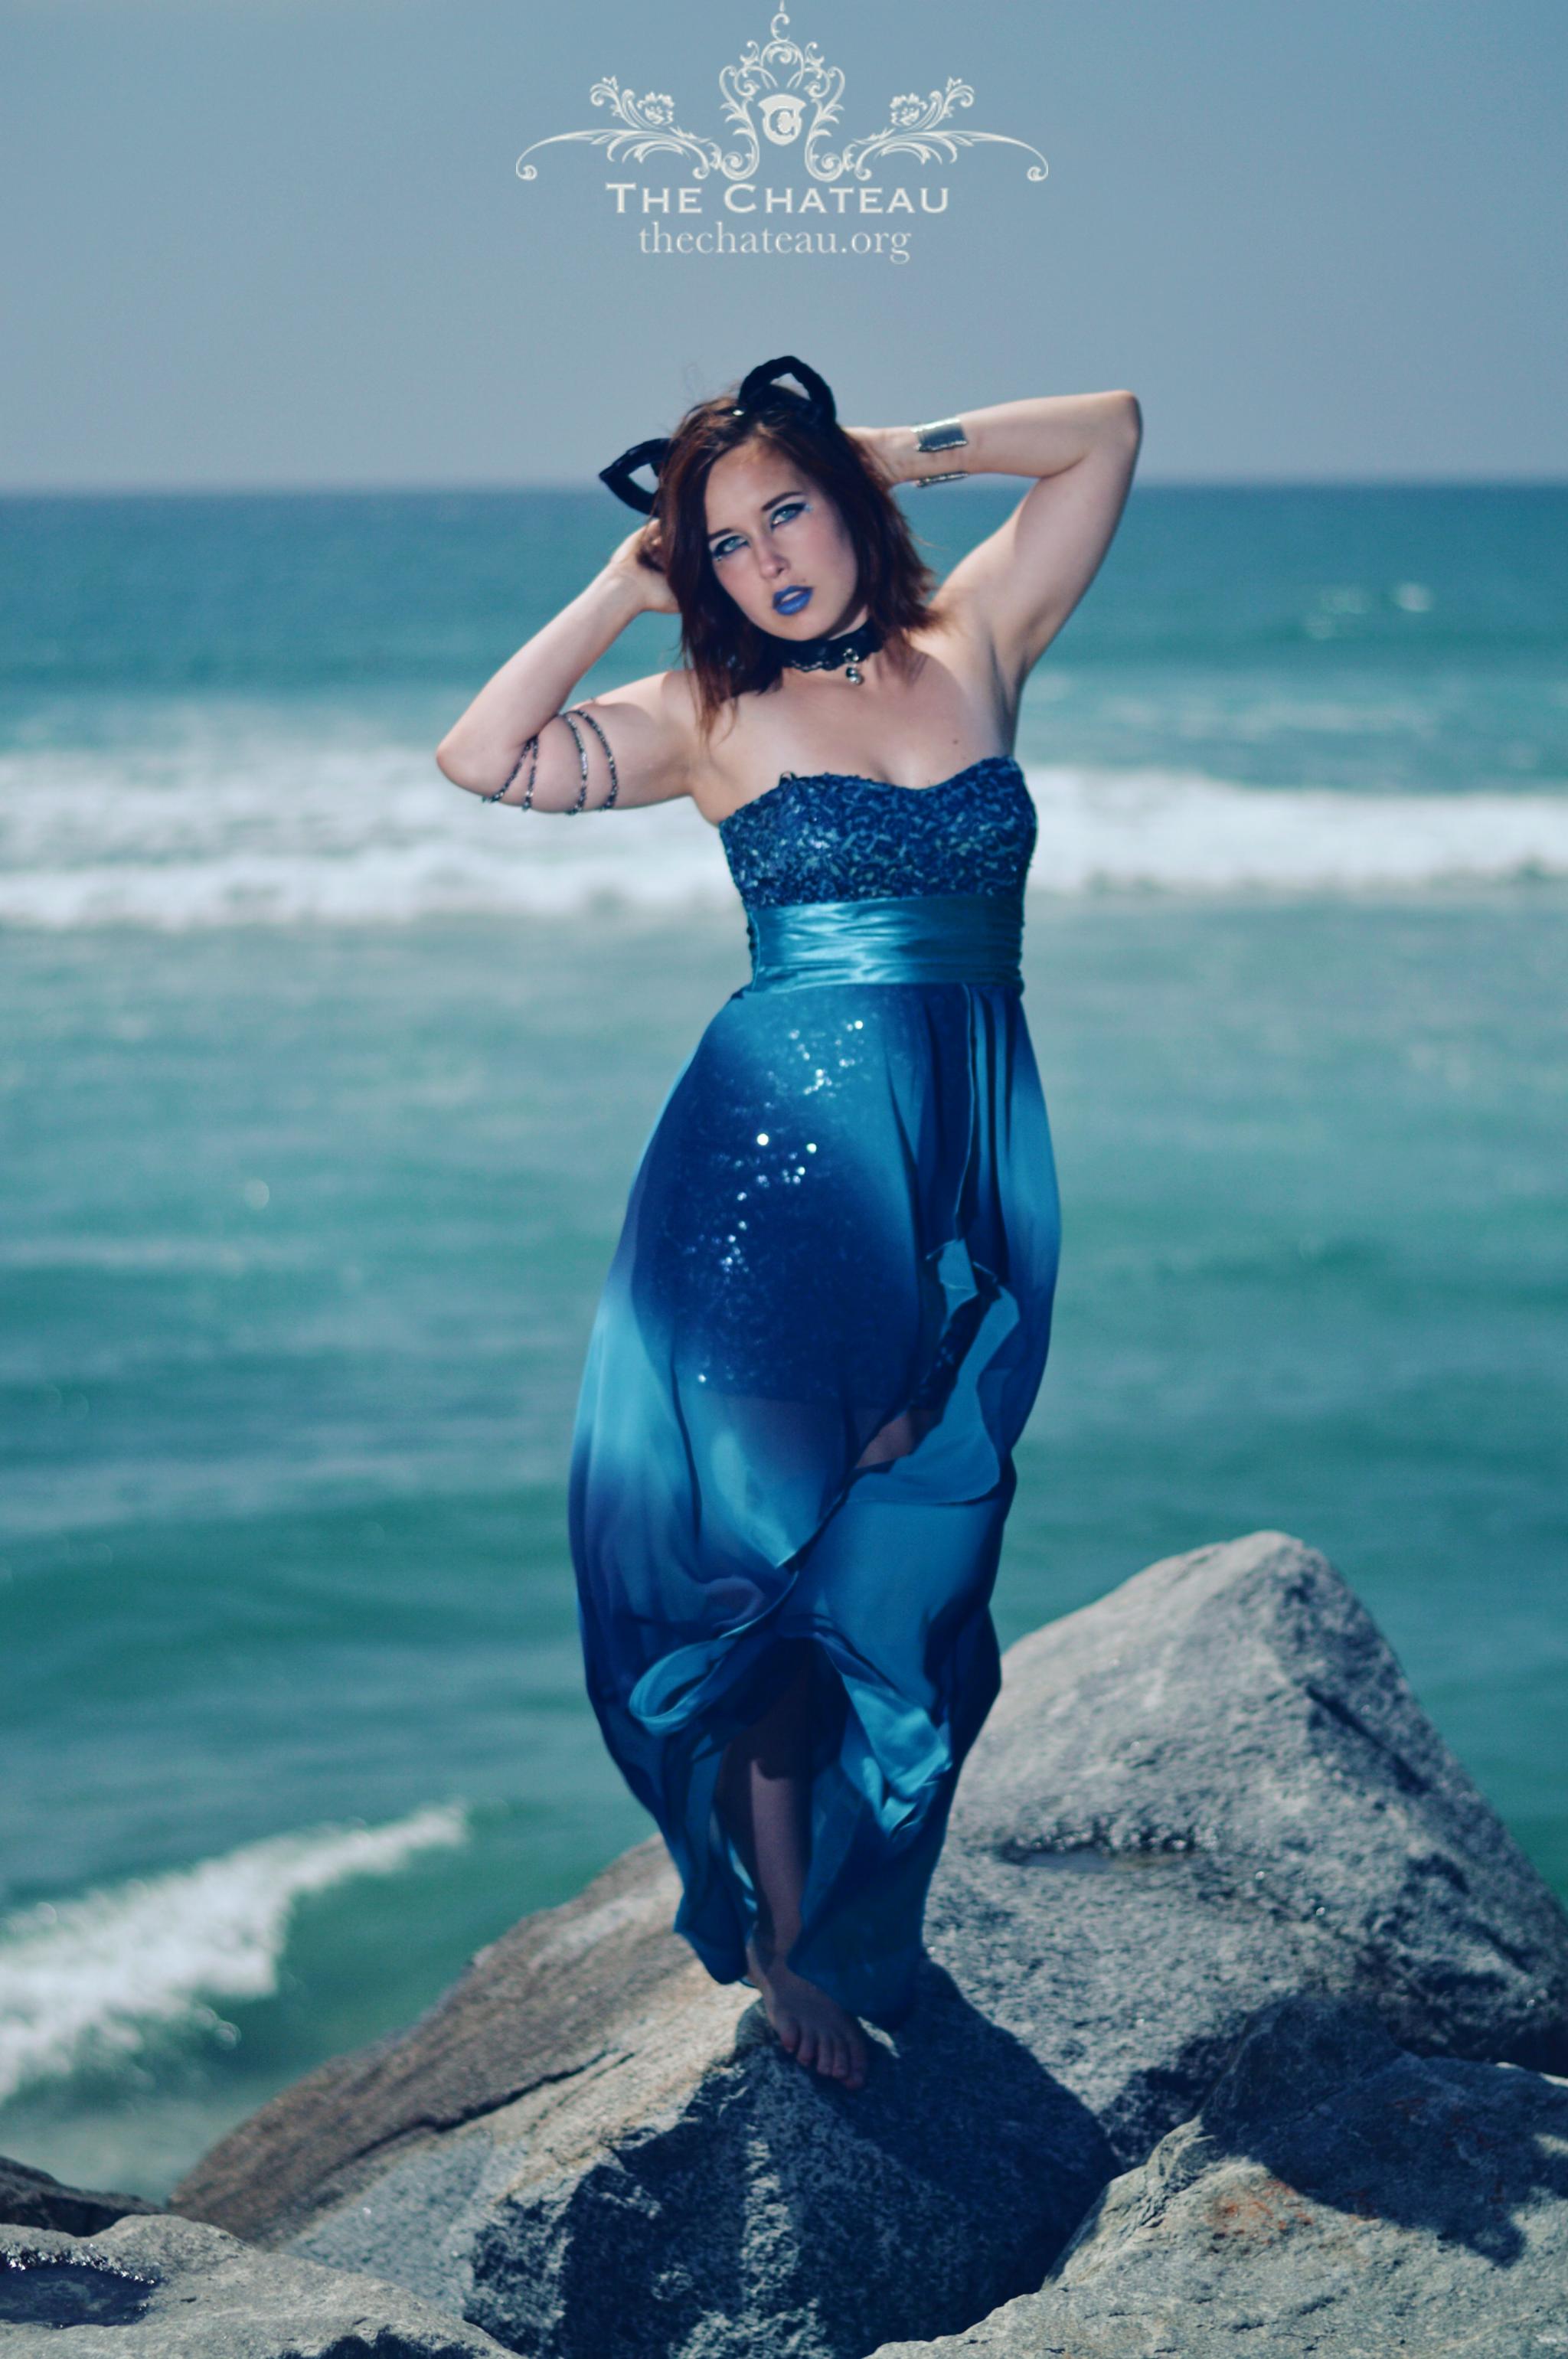 MissGrey's sea Goddess shoot. post thumbnail